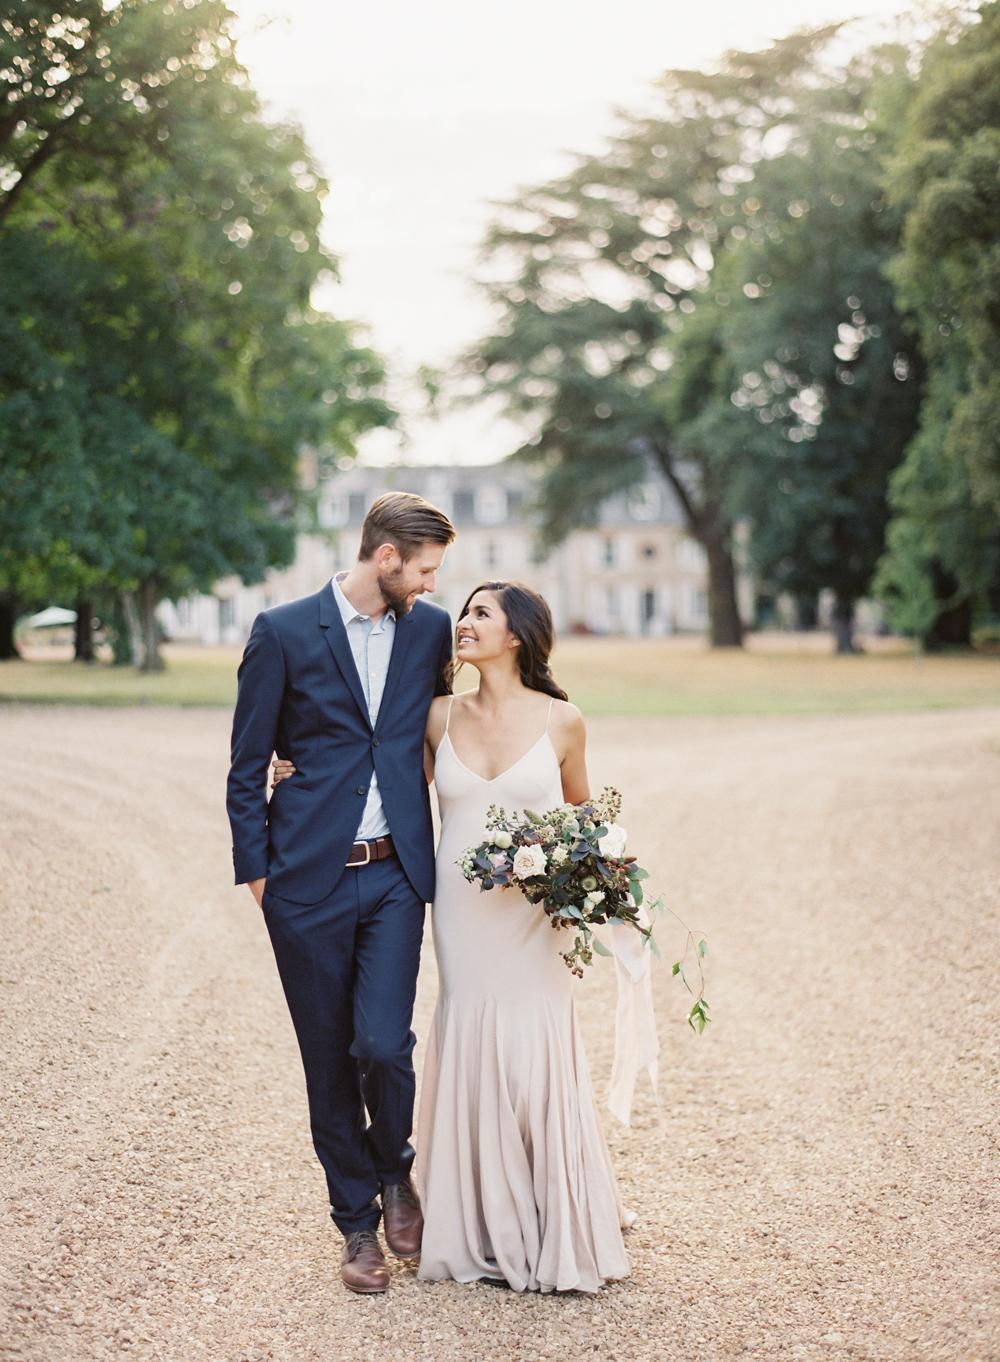 Vicki Grafton Photography Paris France Chateau wedding  Film Wedding photographer -10.jpg